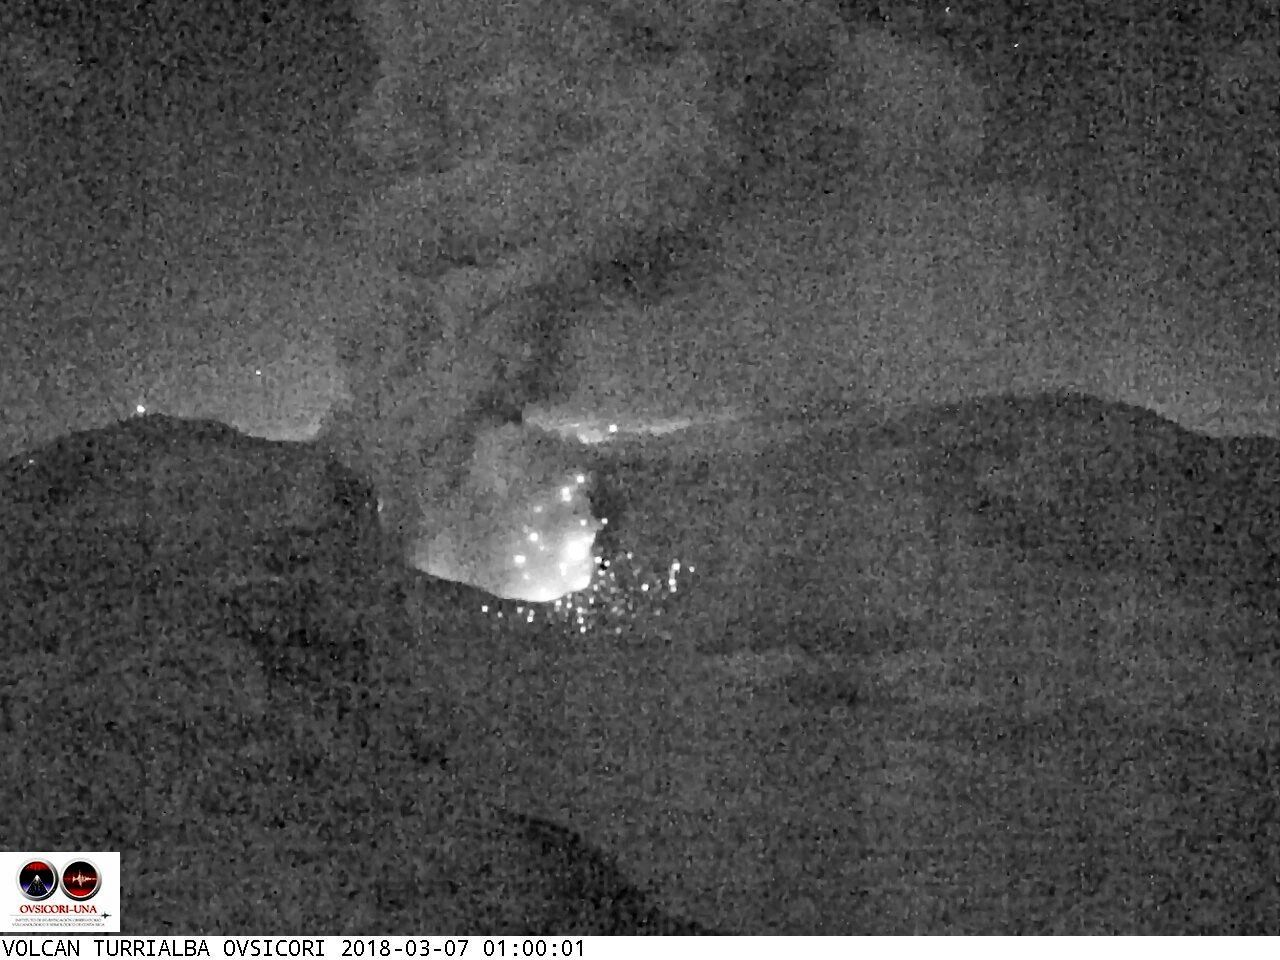 Turrialba - 07.03.2018 / respectivement à 0h00, 0h44 et 1h00 - webcam Ovsicori